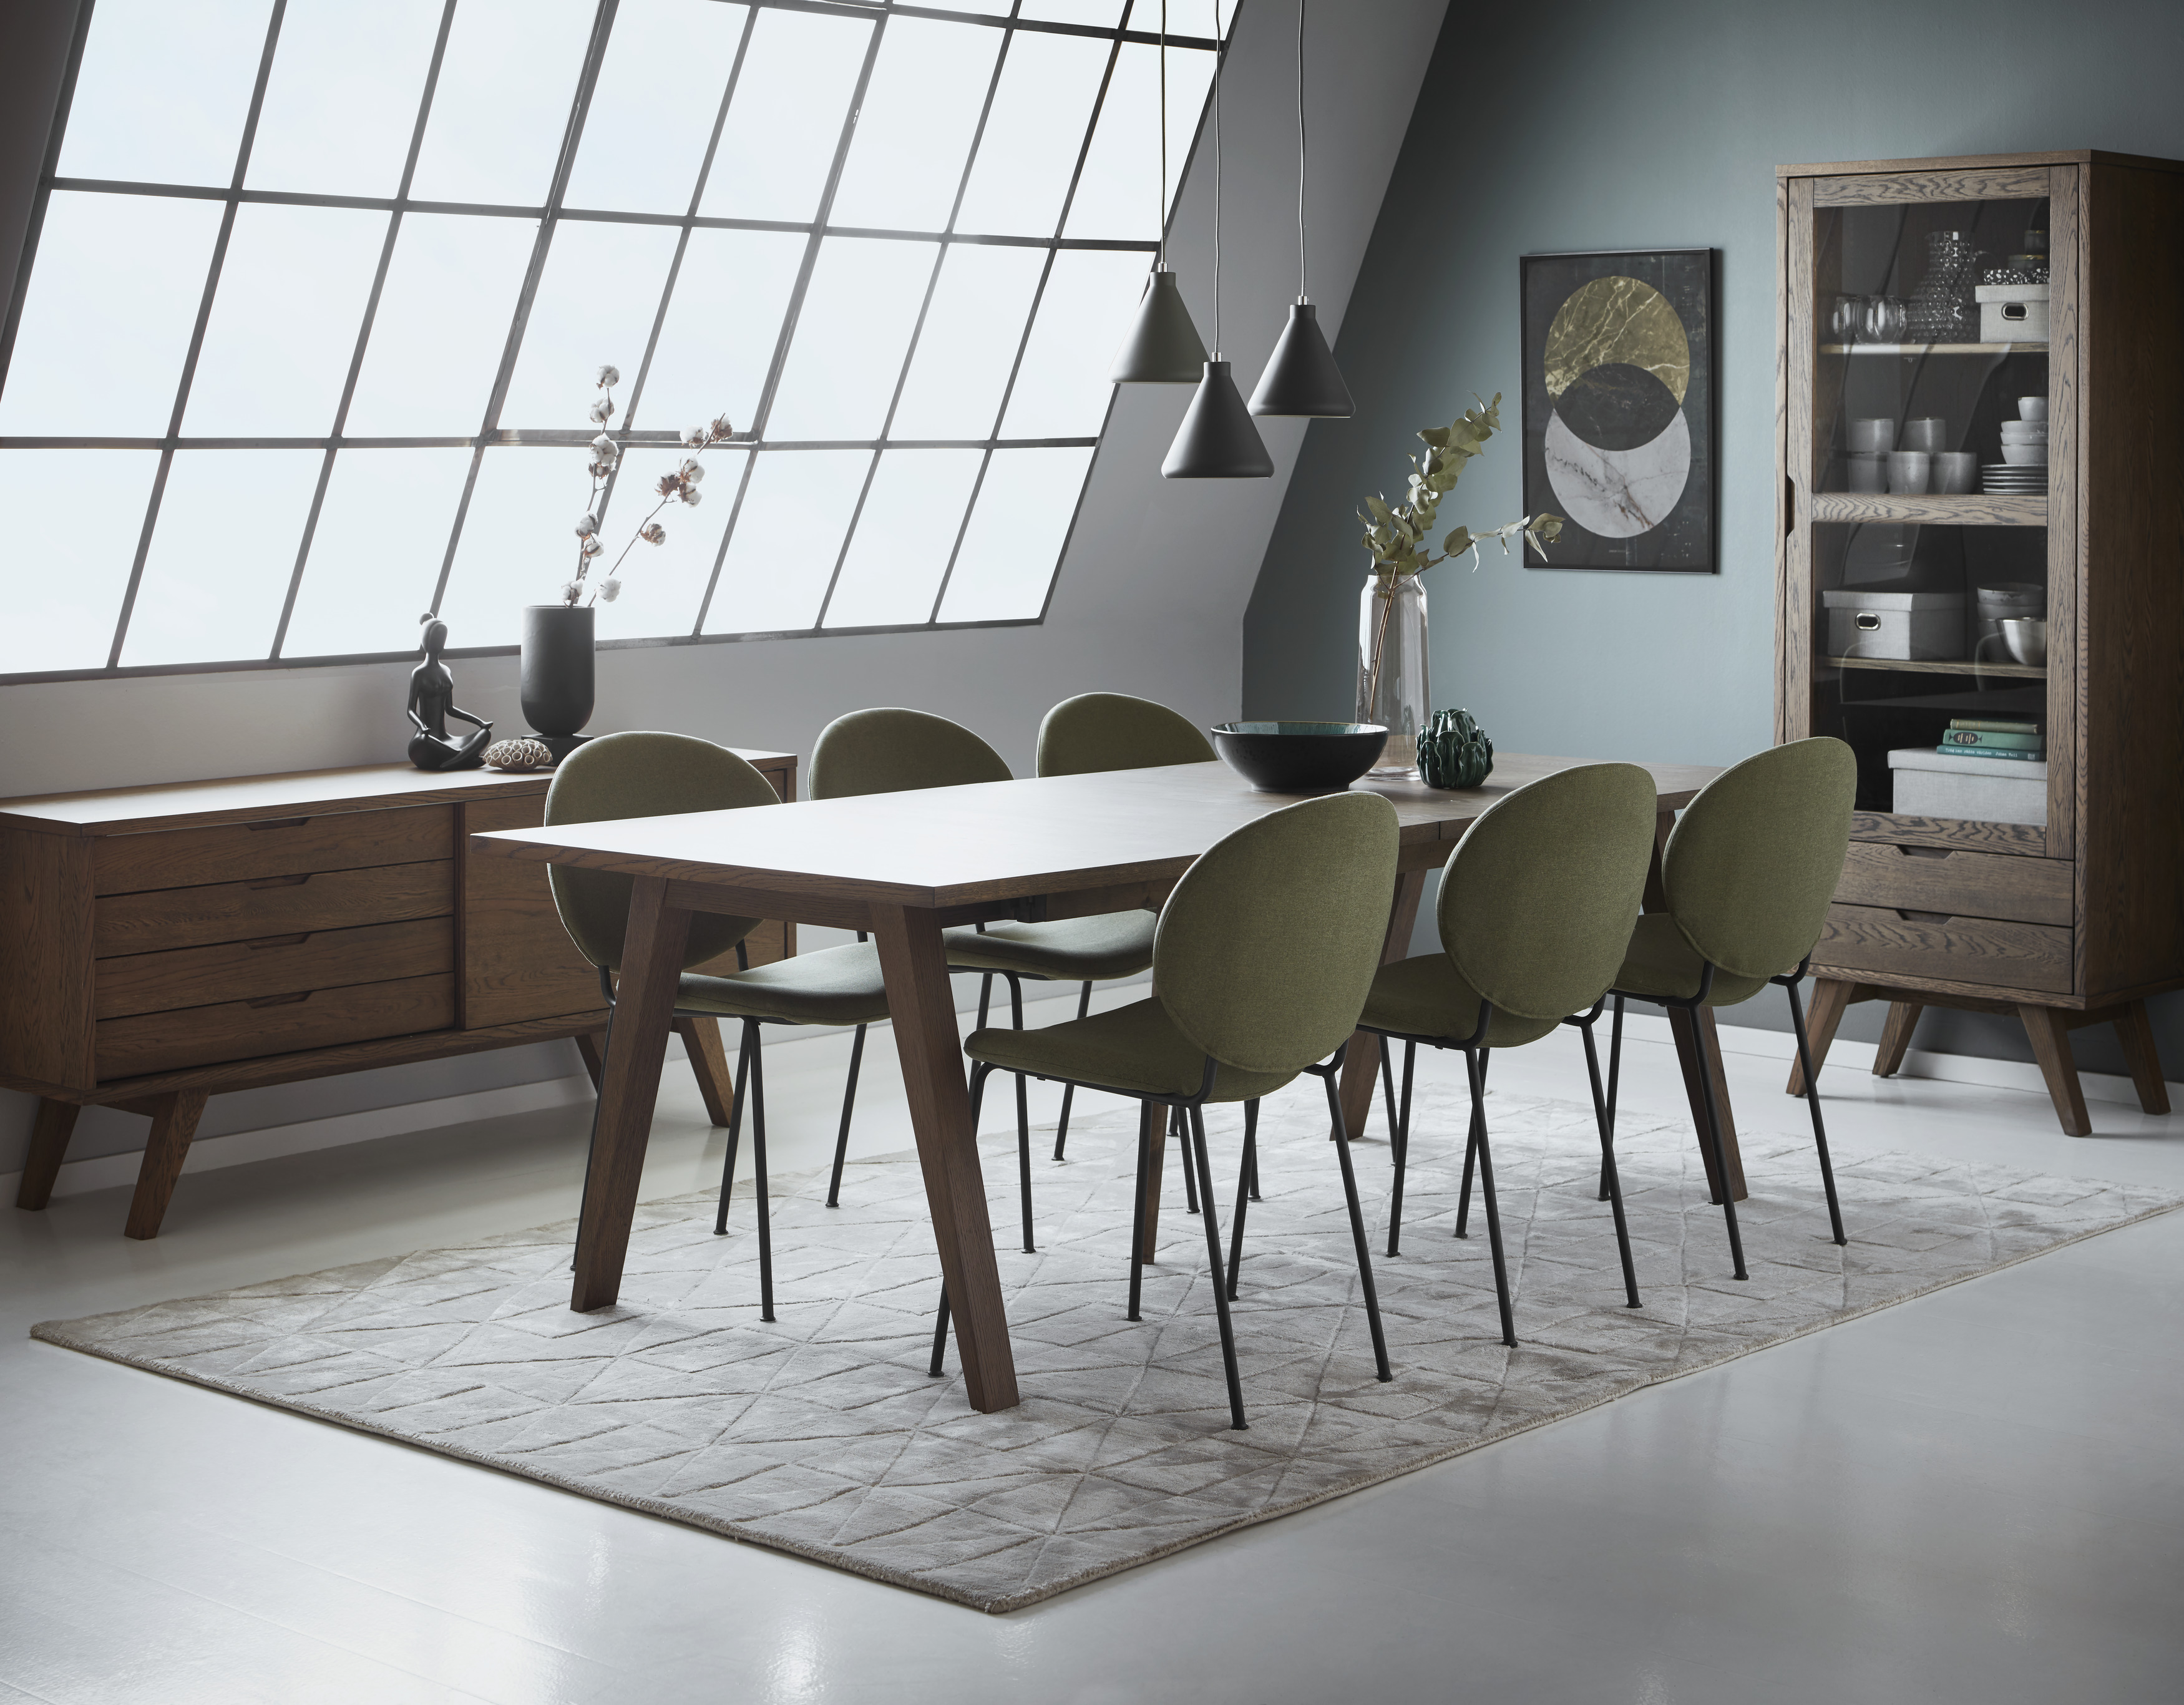 Yard Matgrupp med 6 stolar Ellen | Matbord | Mio | Stolar